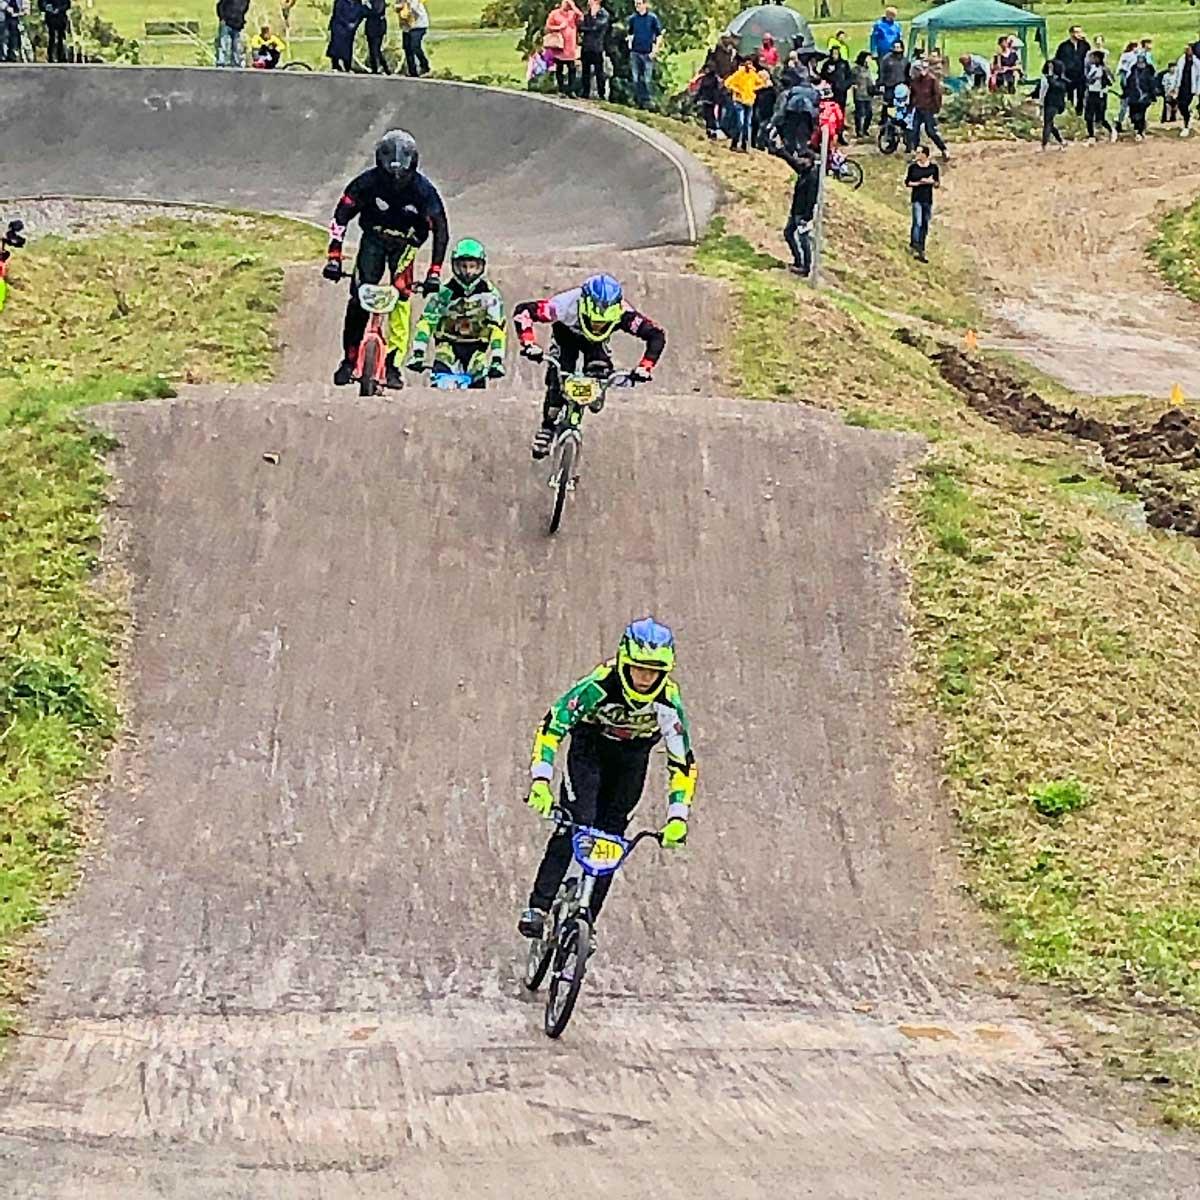 Brixton BMX winning at Brockwell Track